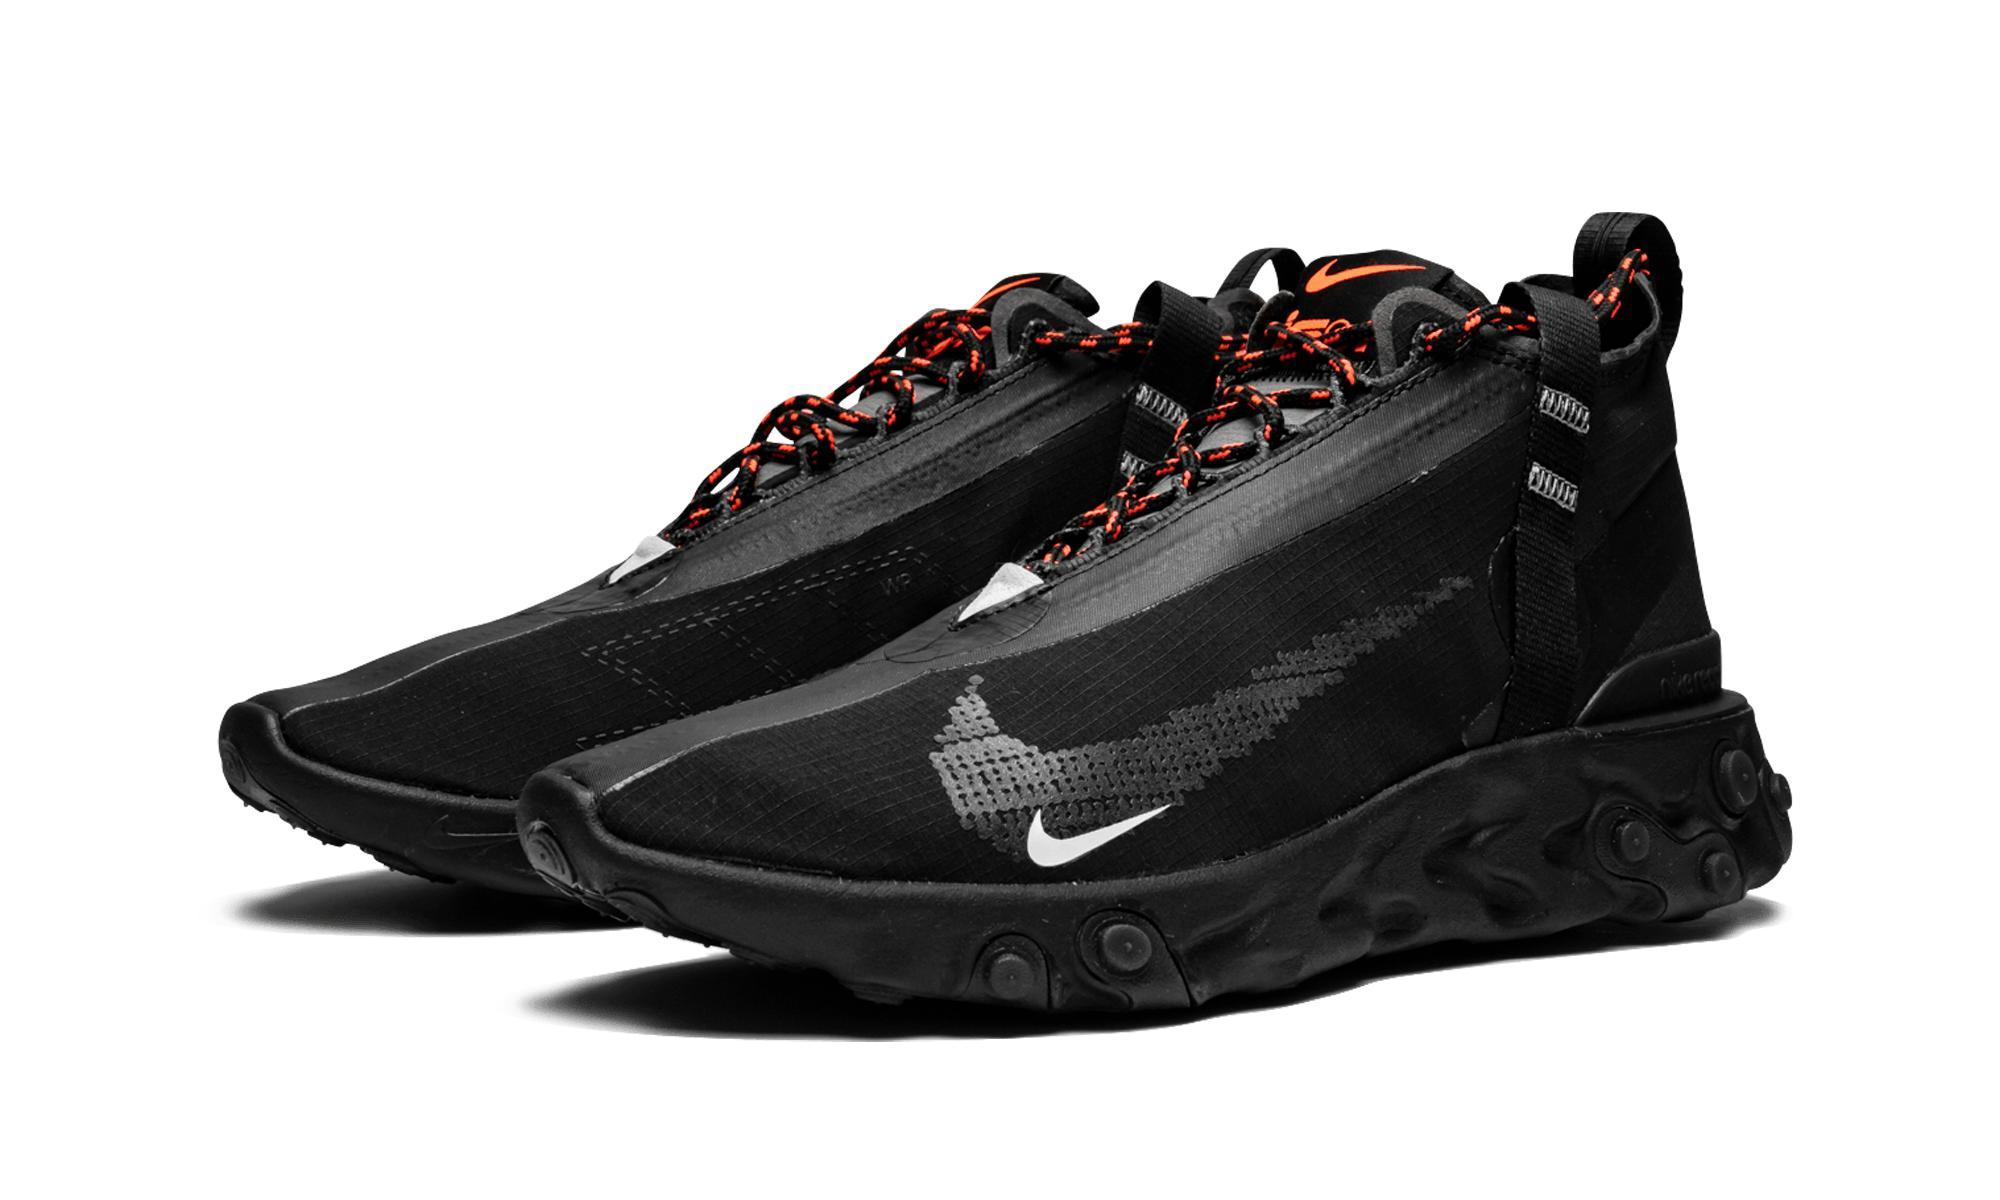 8b3520f1ca5 Nike - Black React Runner Mid Wr Ispa for Men - Lyst. View fullscreen